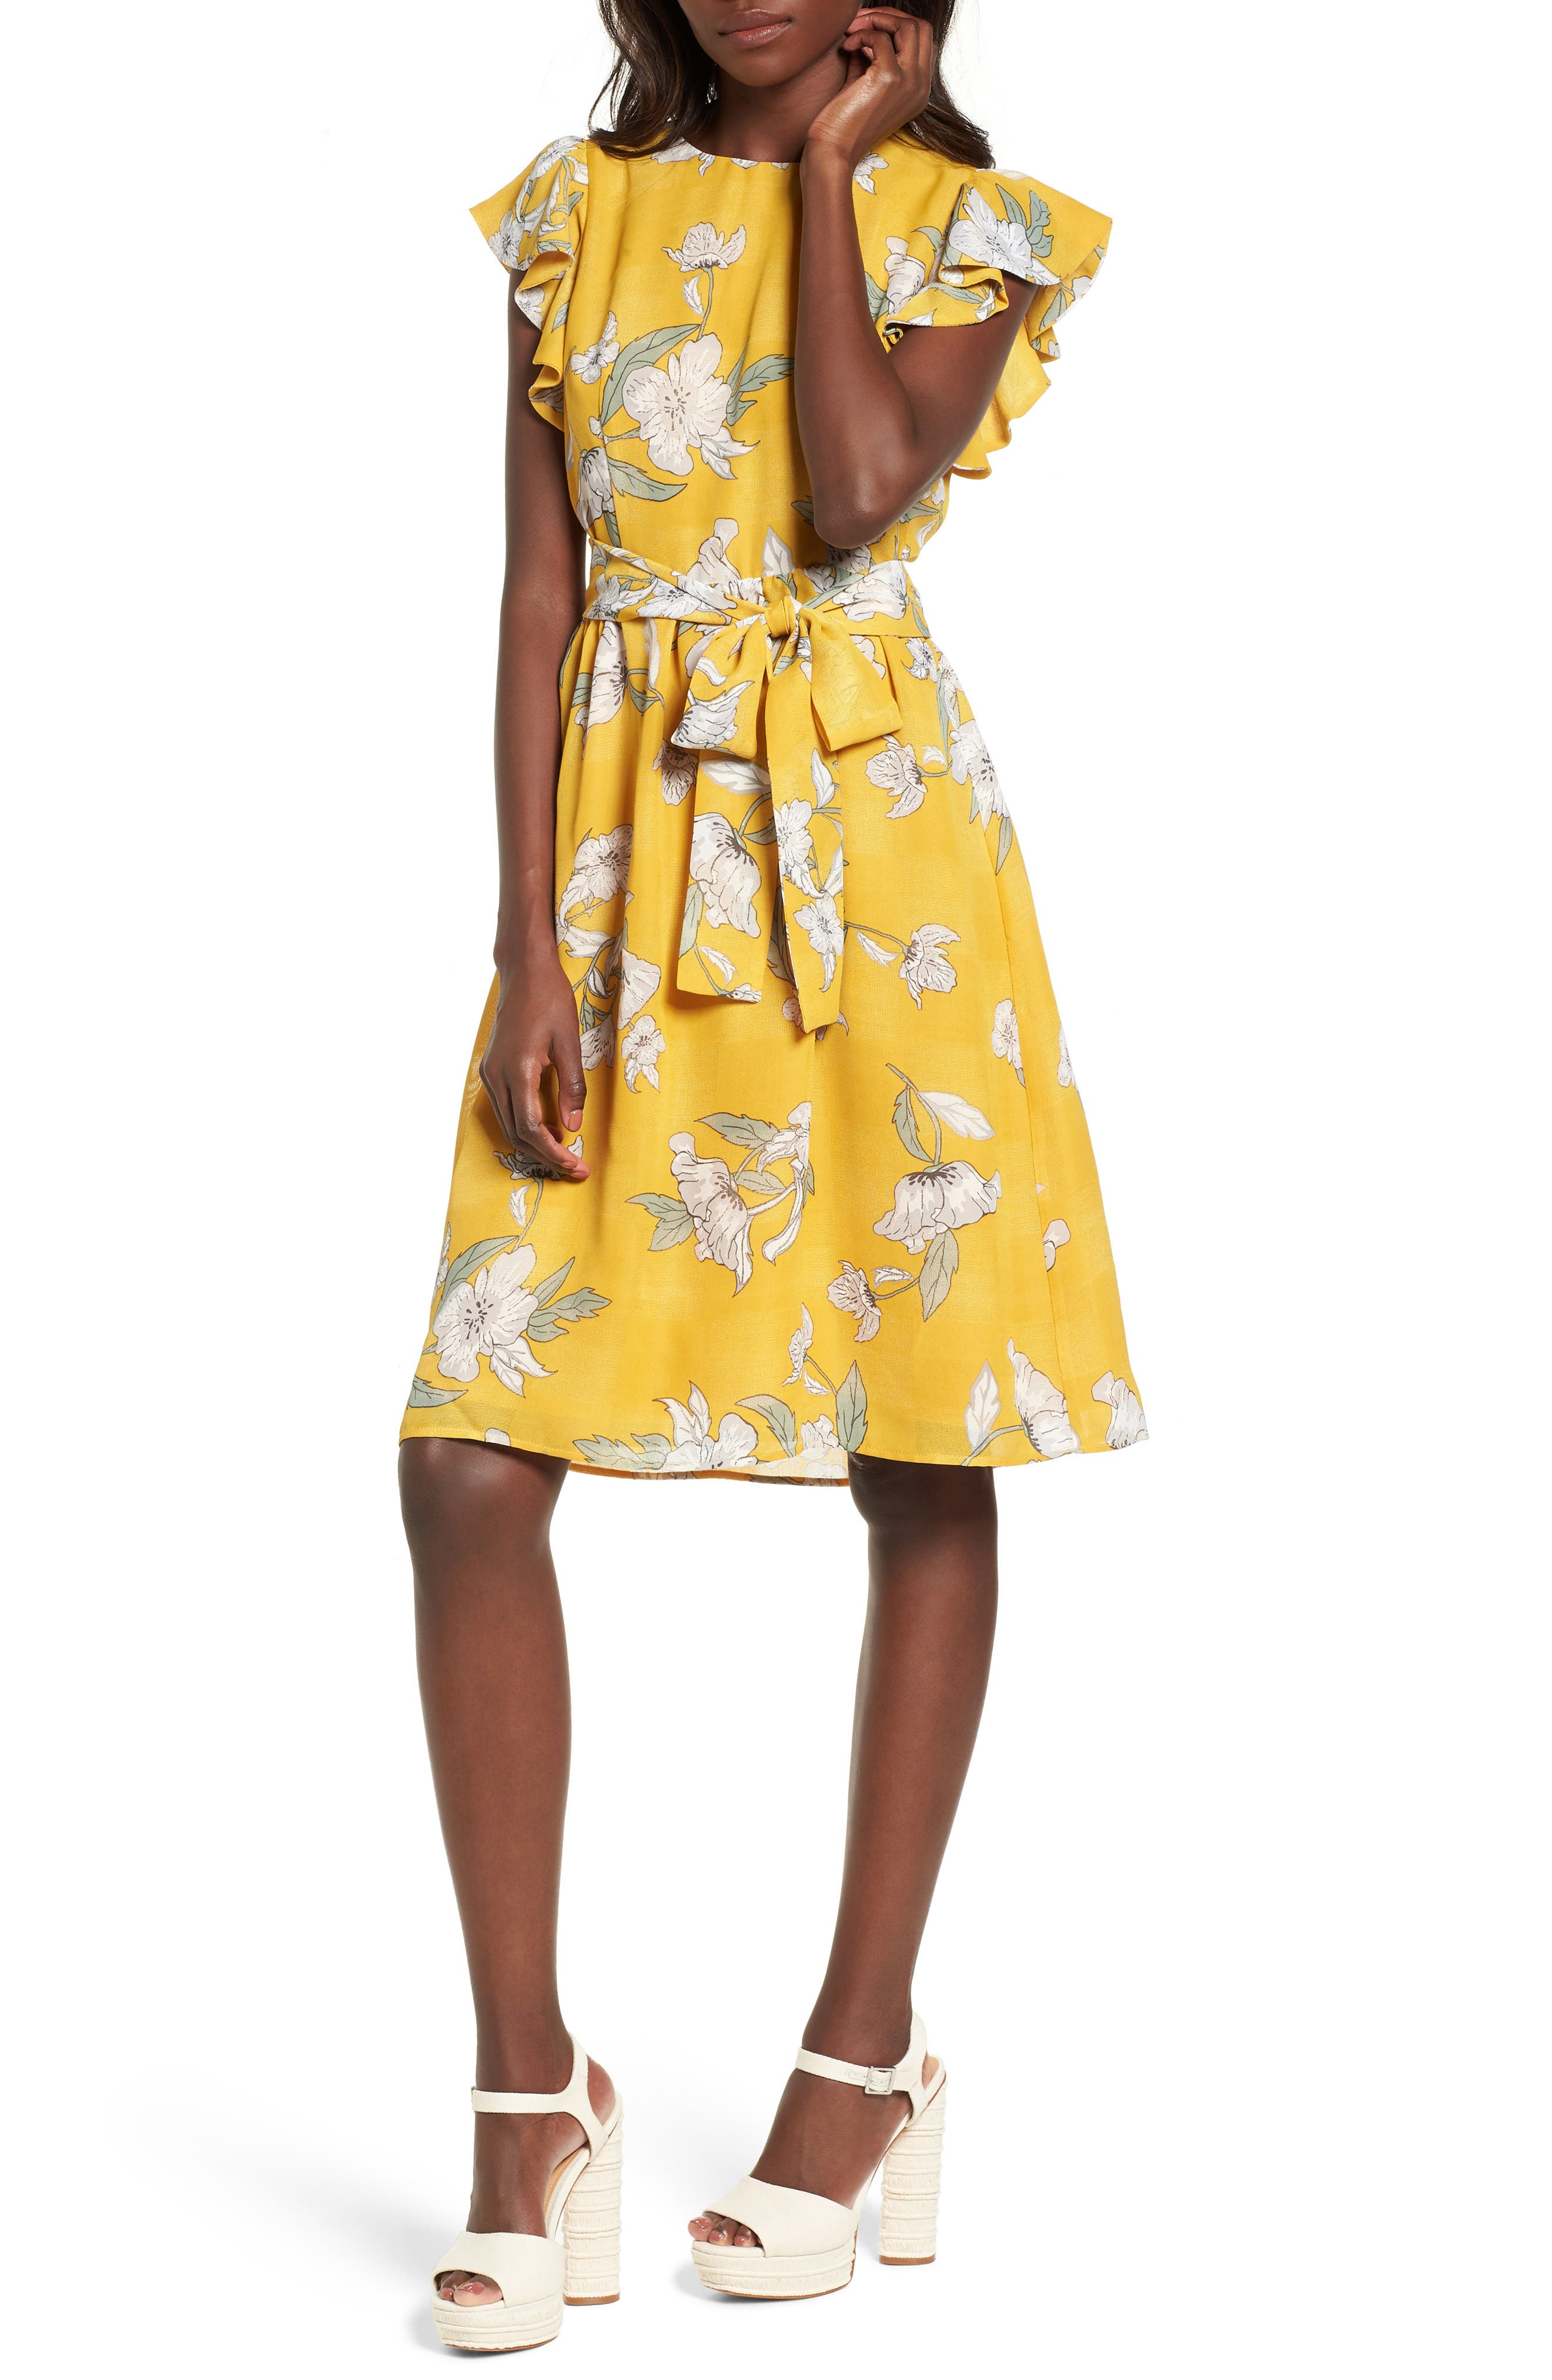 Main Image - Chriselle x J.O.A. Fit & Flare Dress